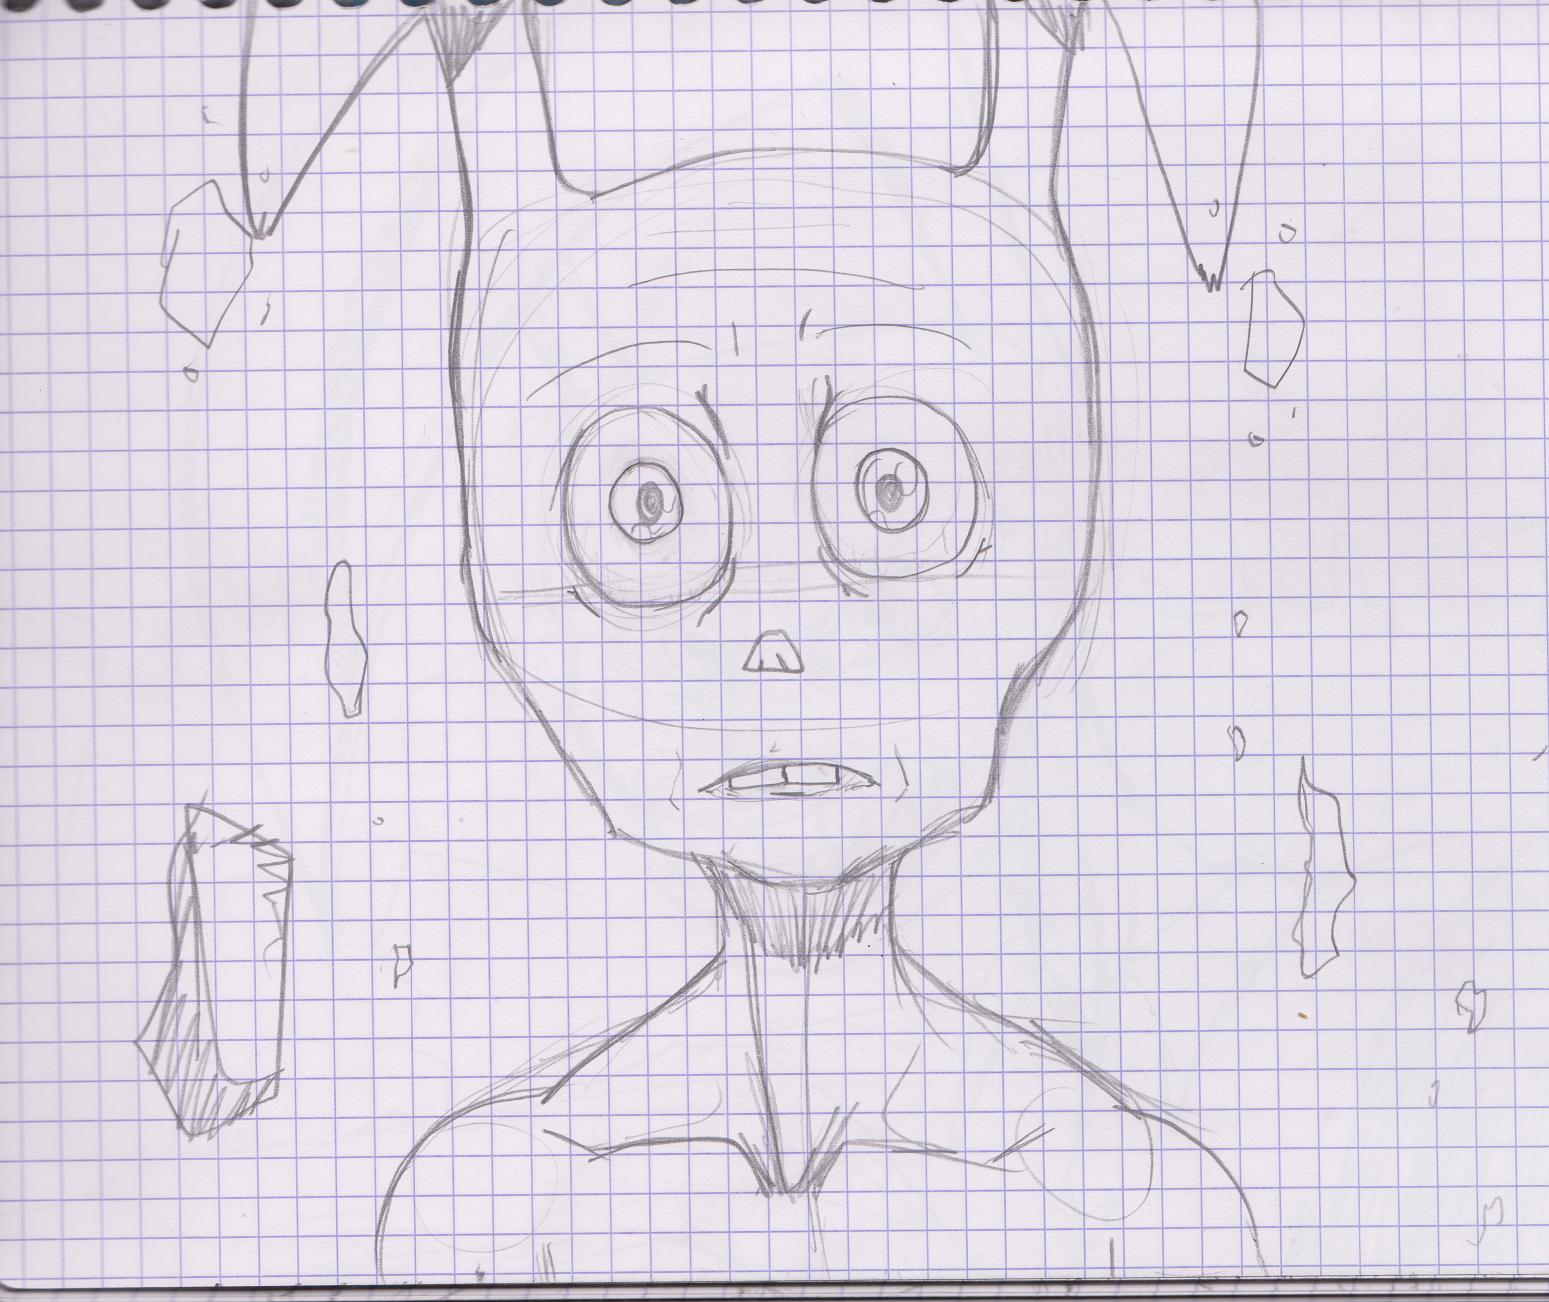 SH sketchbook page 63